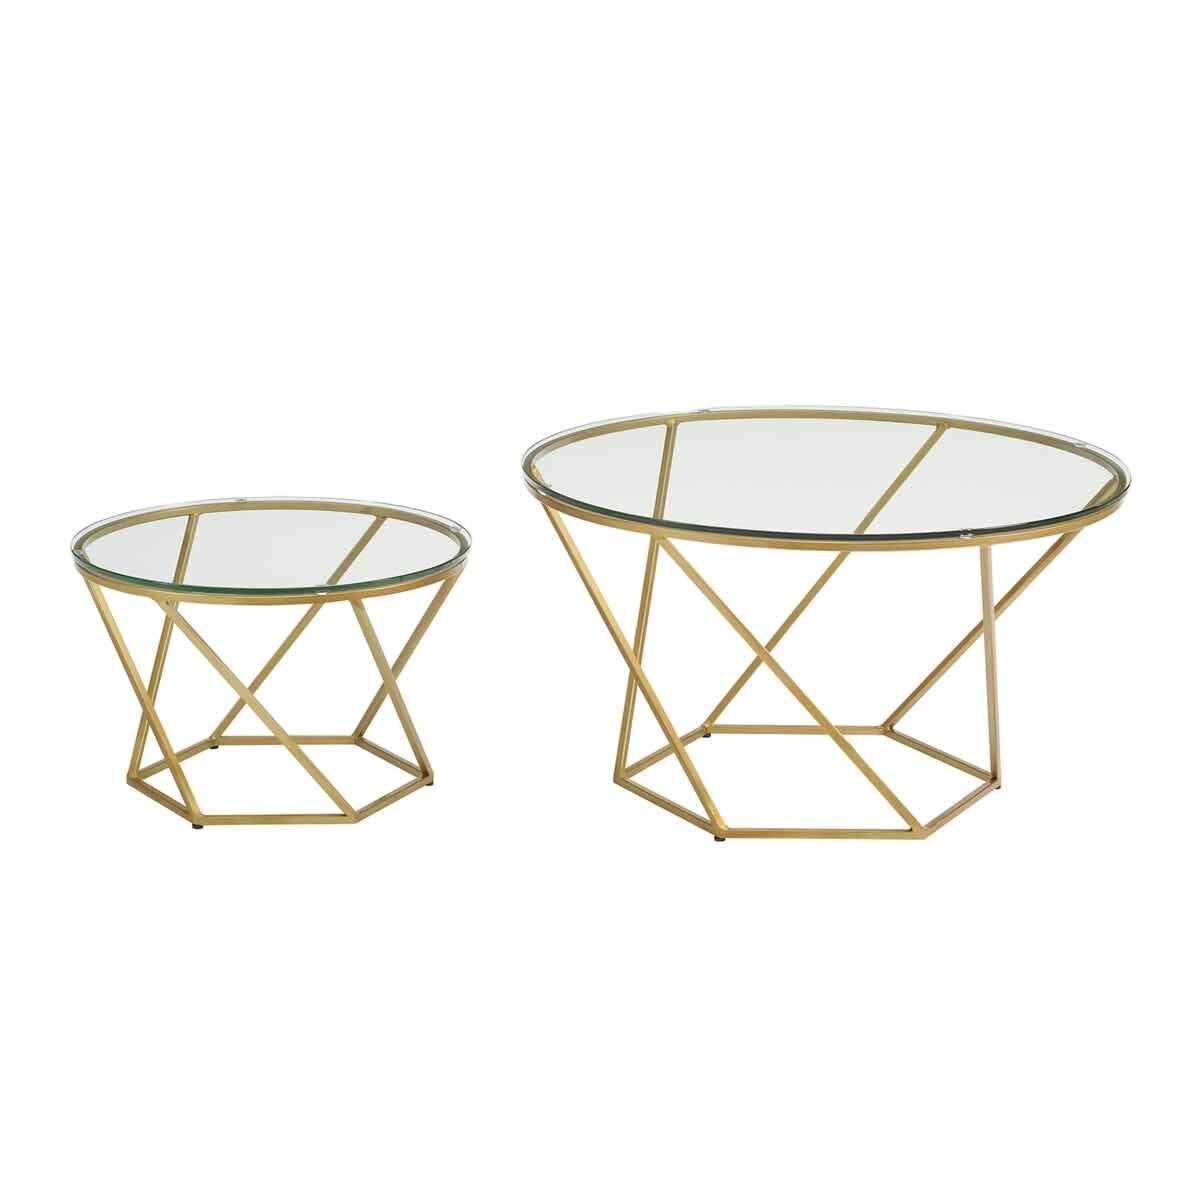 Pamplona Modern Nesting Tables Set of 2 Gold